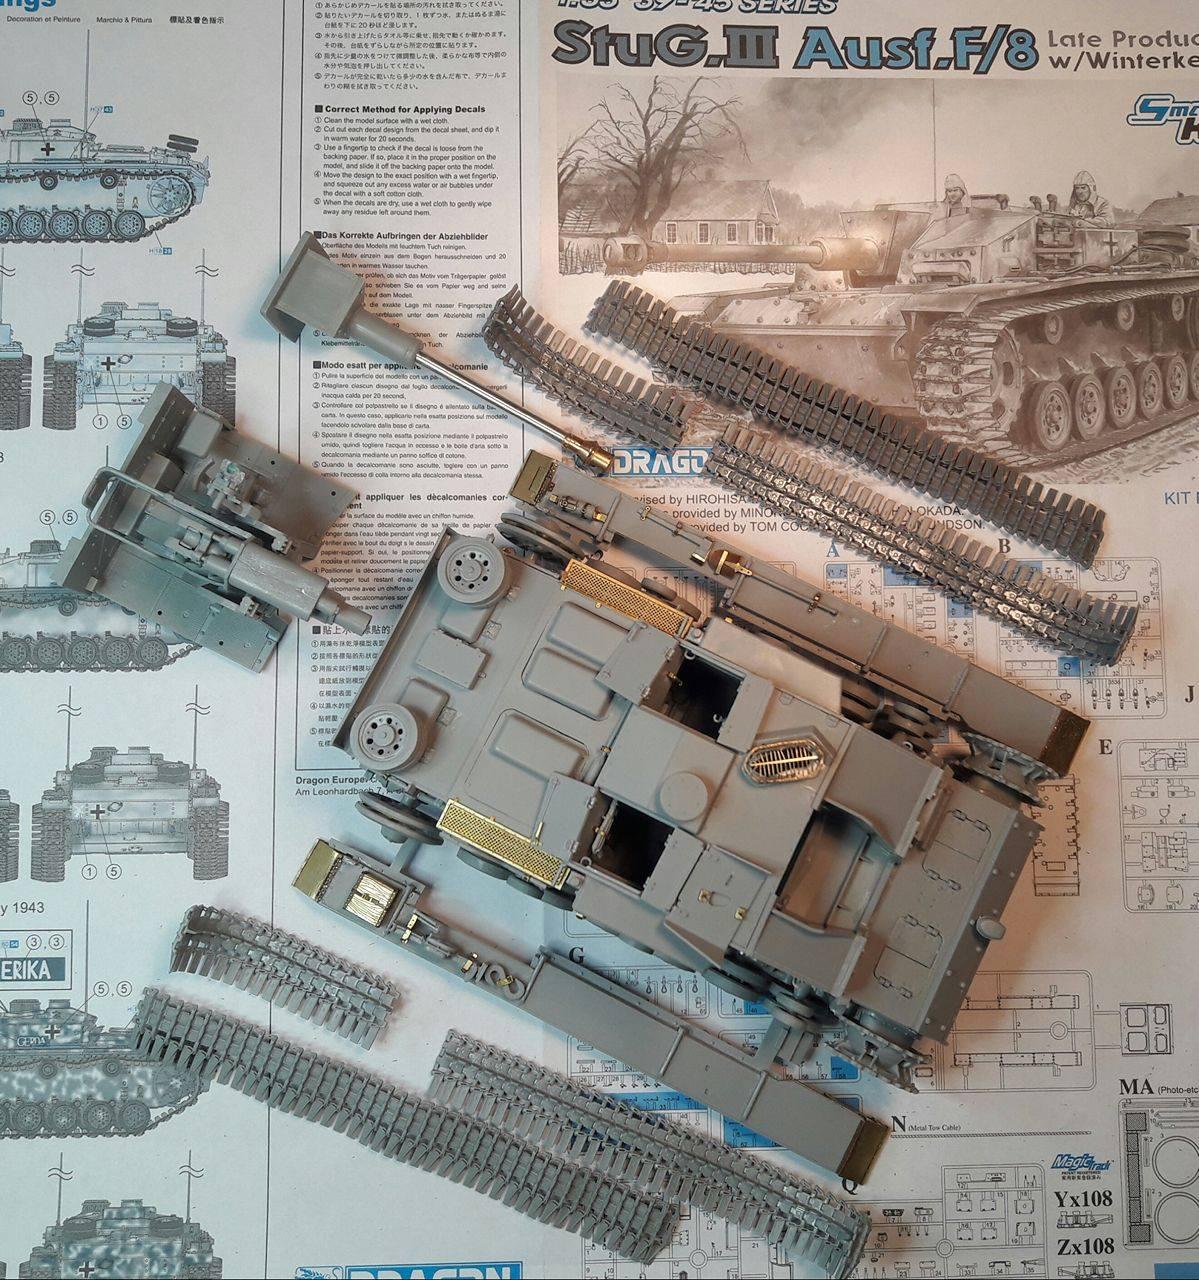 StuG.III Ausf.F/8 late production w/Winterketten - 1/35 - Page 2 183638STUGMajorParts